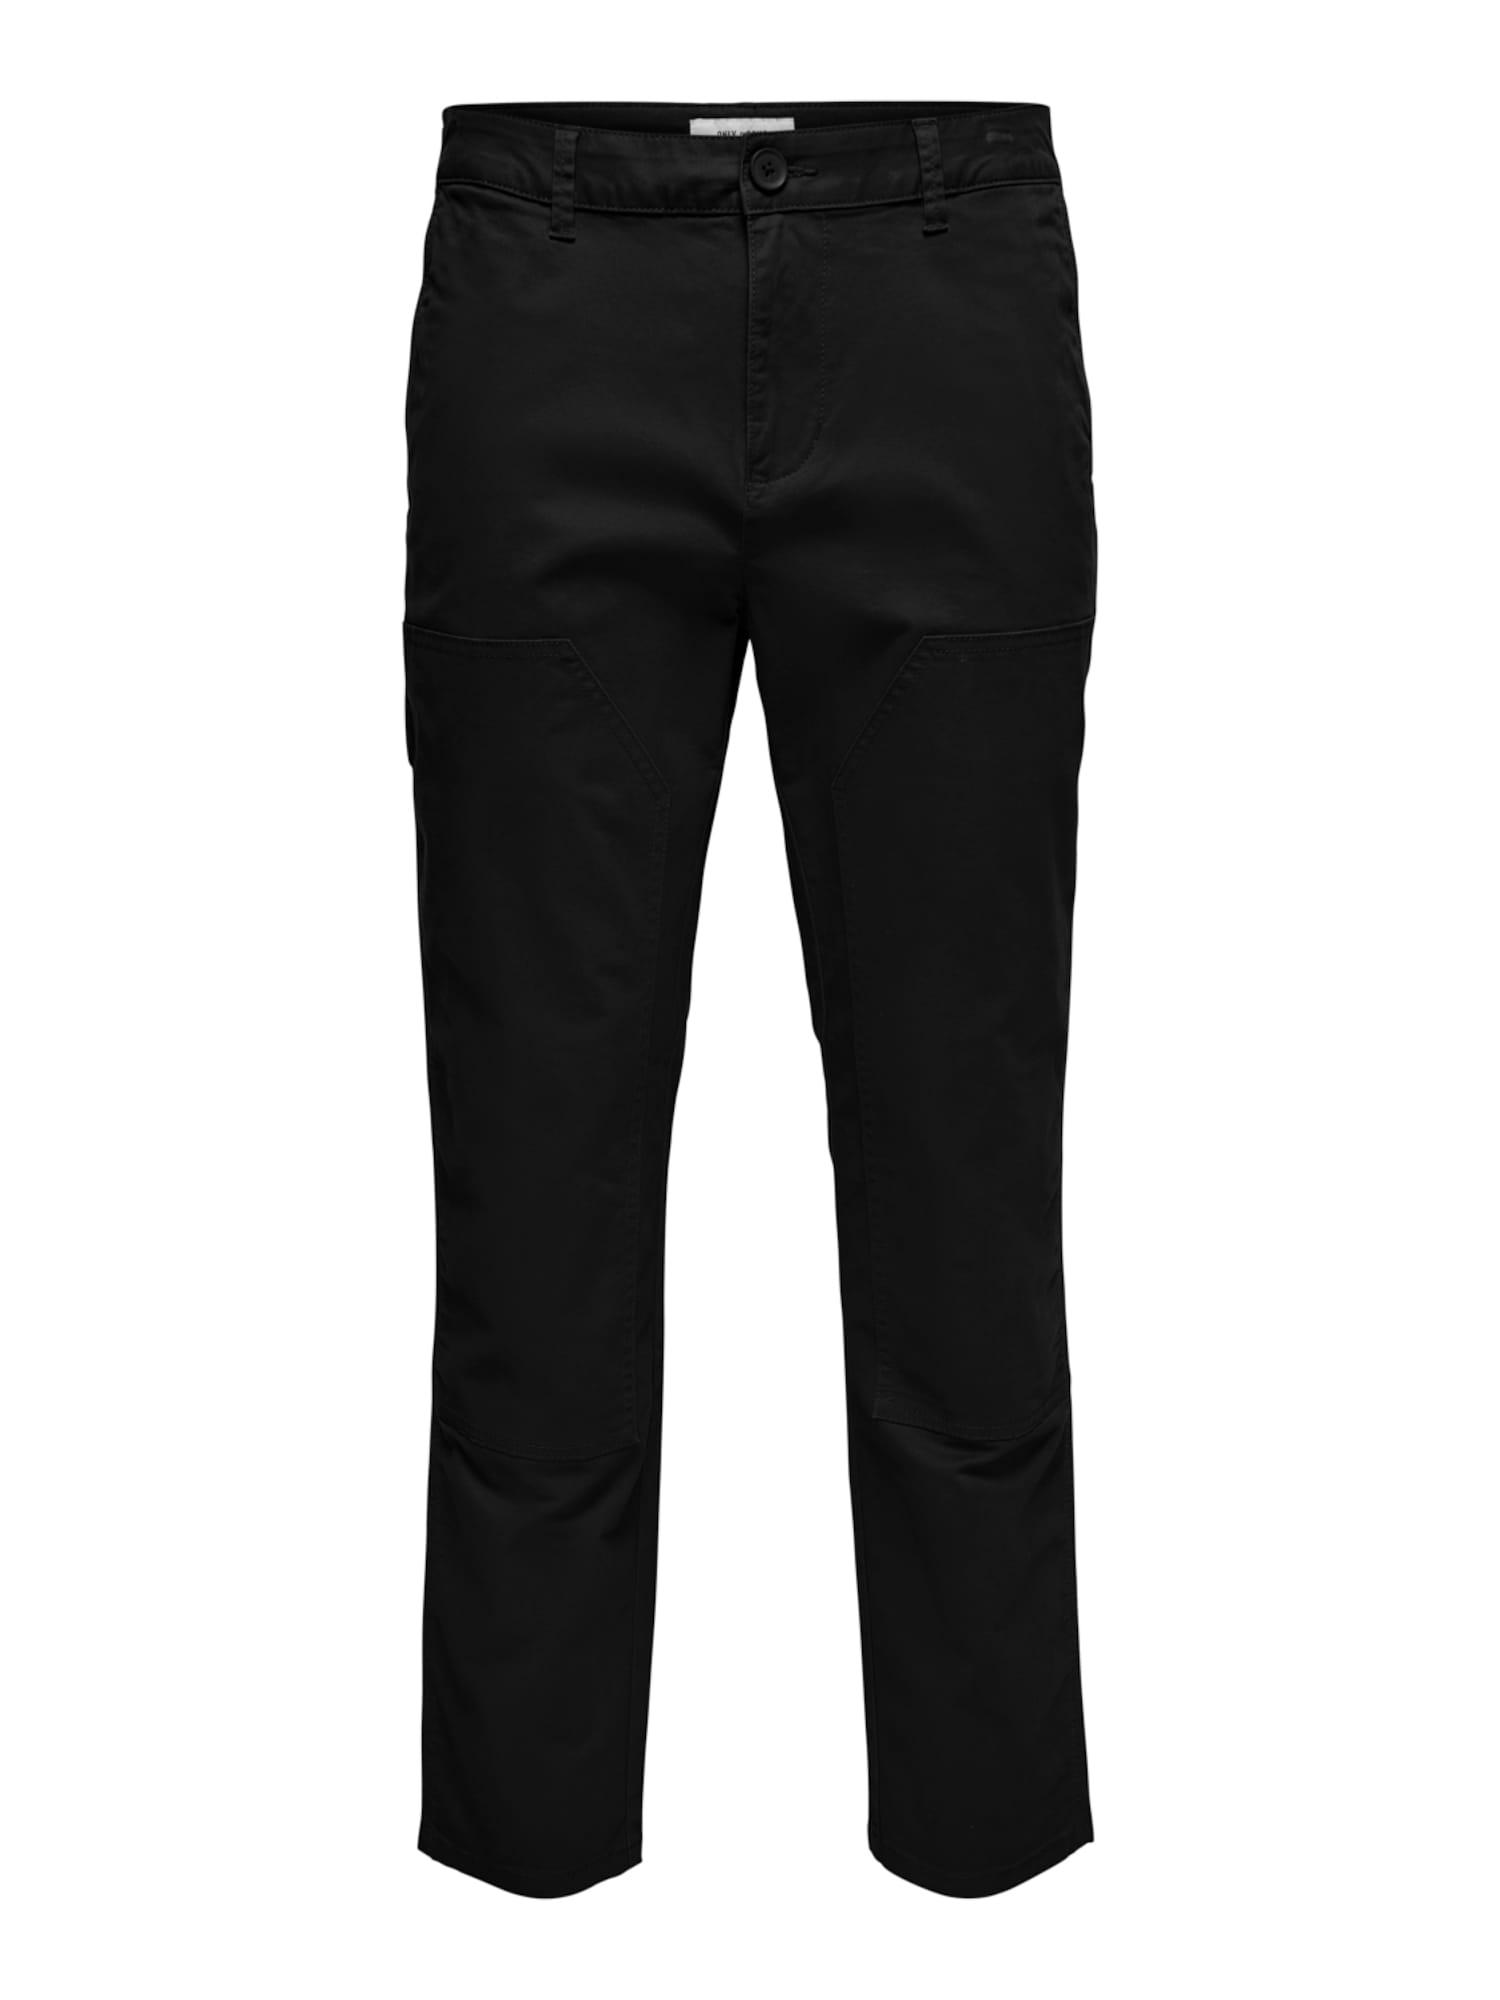 Only & Sons Pantalon 'Cam'  - Noir - Taille: 30 - male